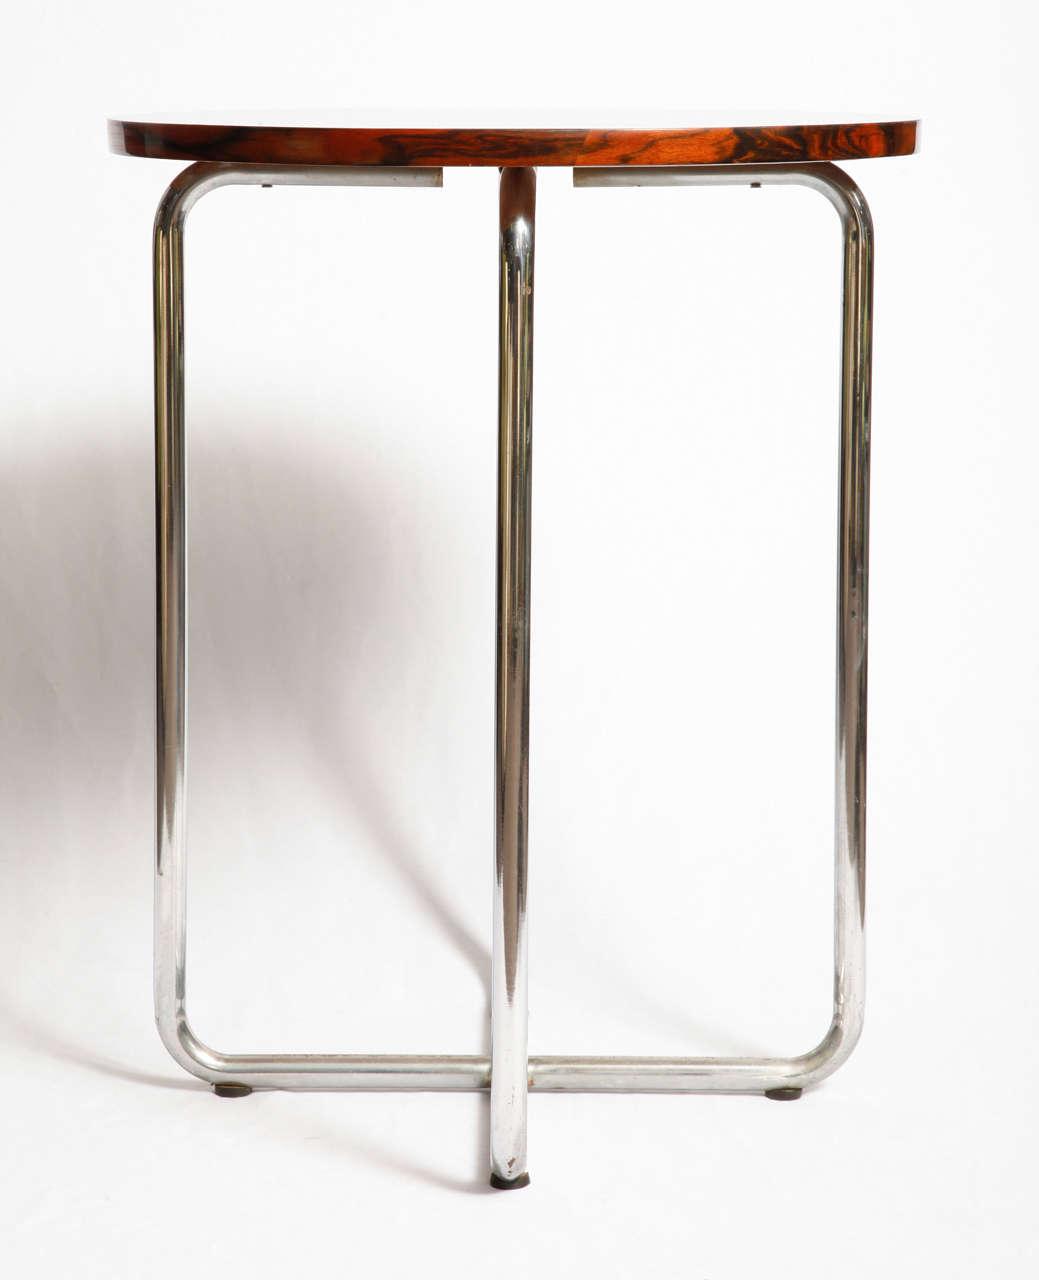 art deco gueridon for sale at 1stdibs. Black Bedroom Furniture Sets. Home Design Ideas